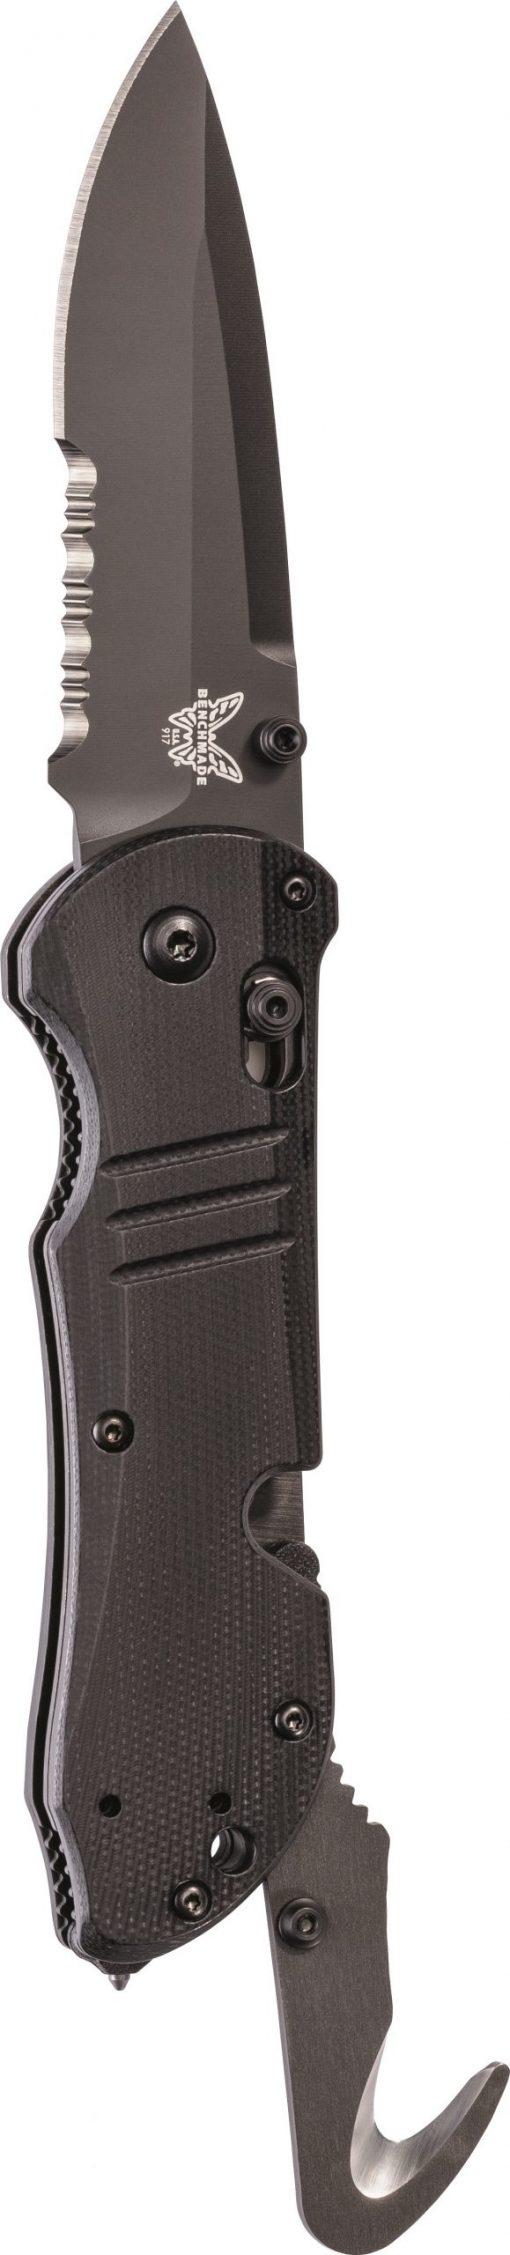 Benchmade Tactical Triage Black S30V Blade Black G-10 Handle Blue Liner Front Side Open Up Cutter Open